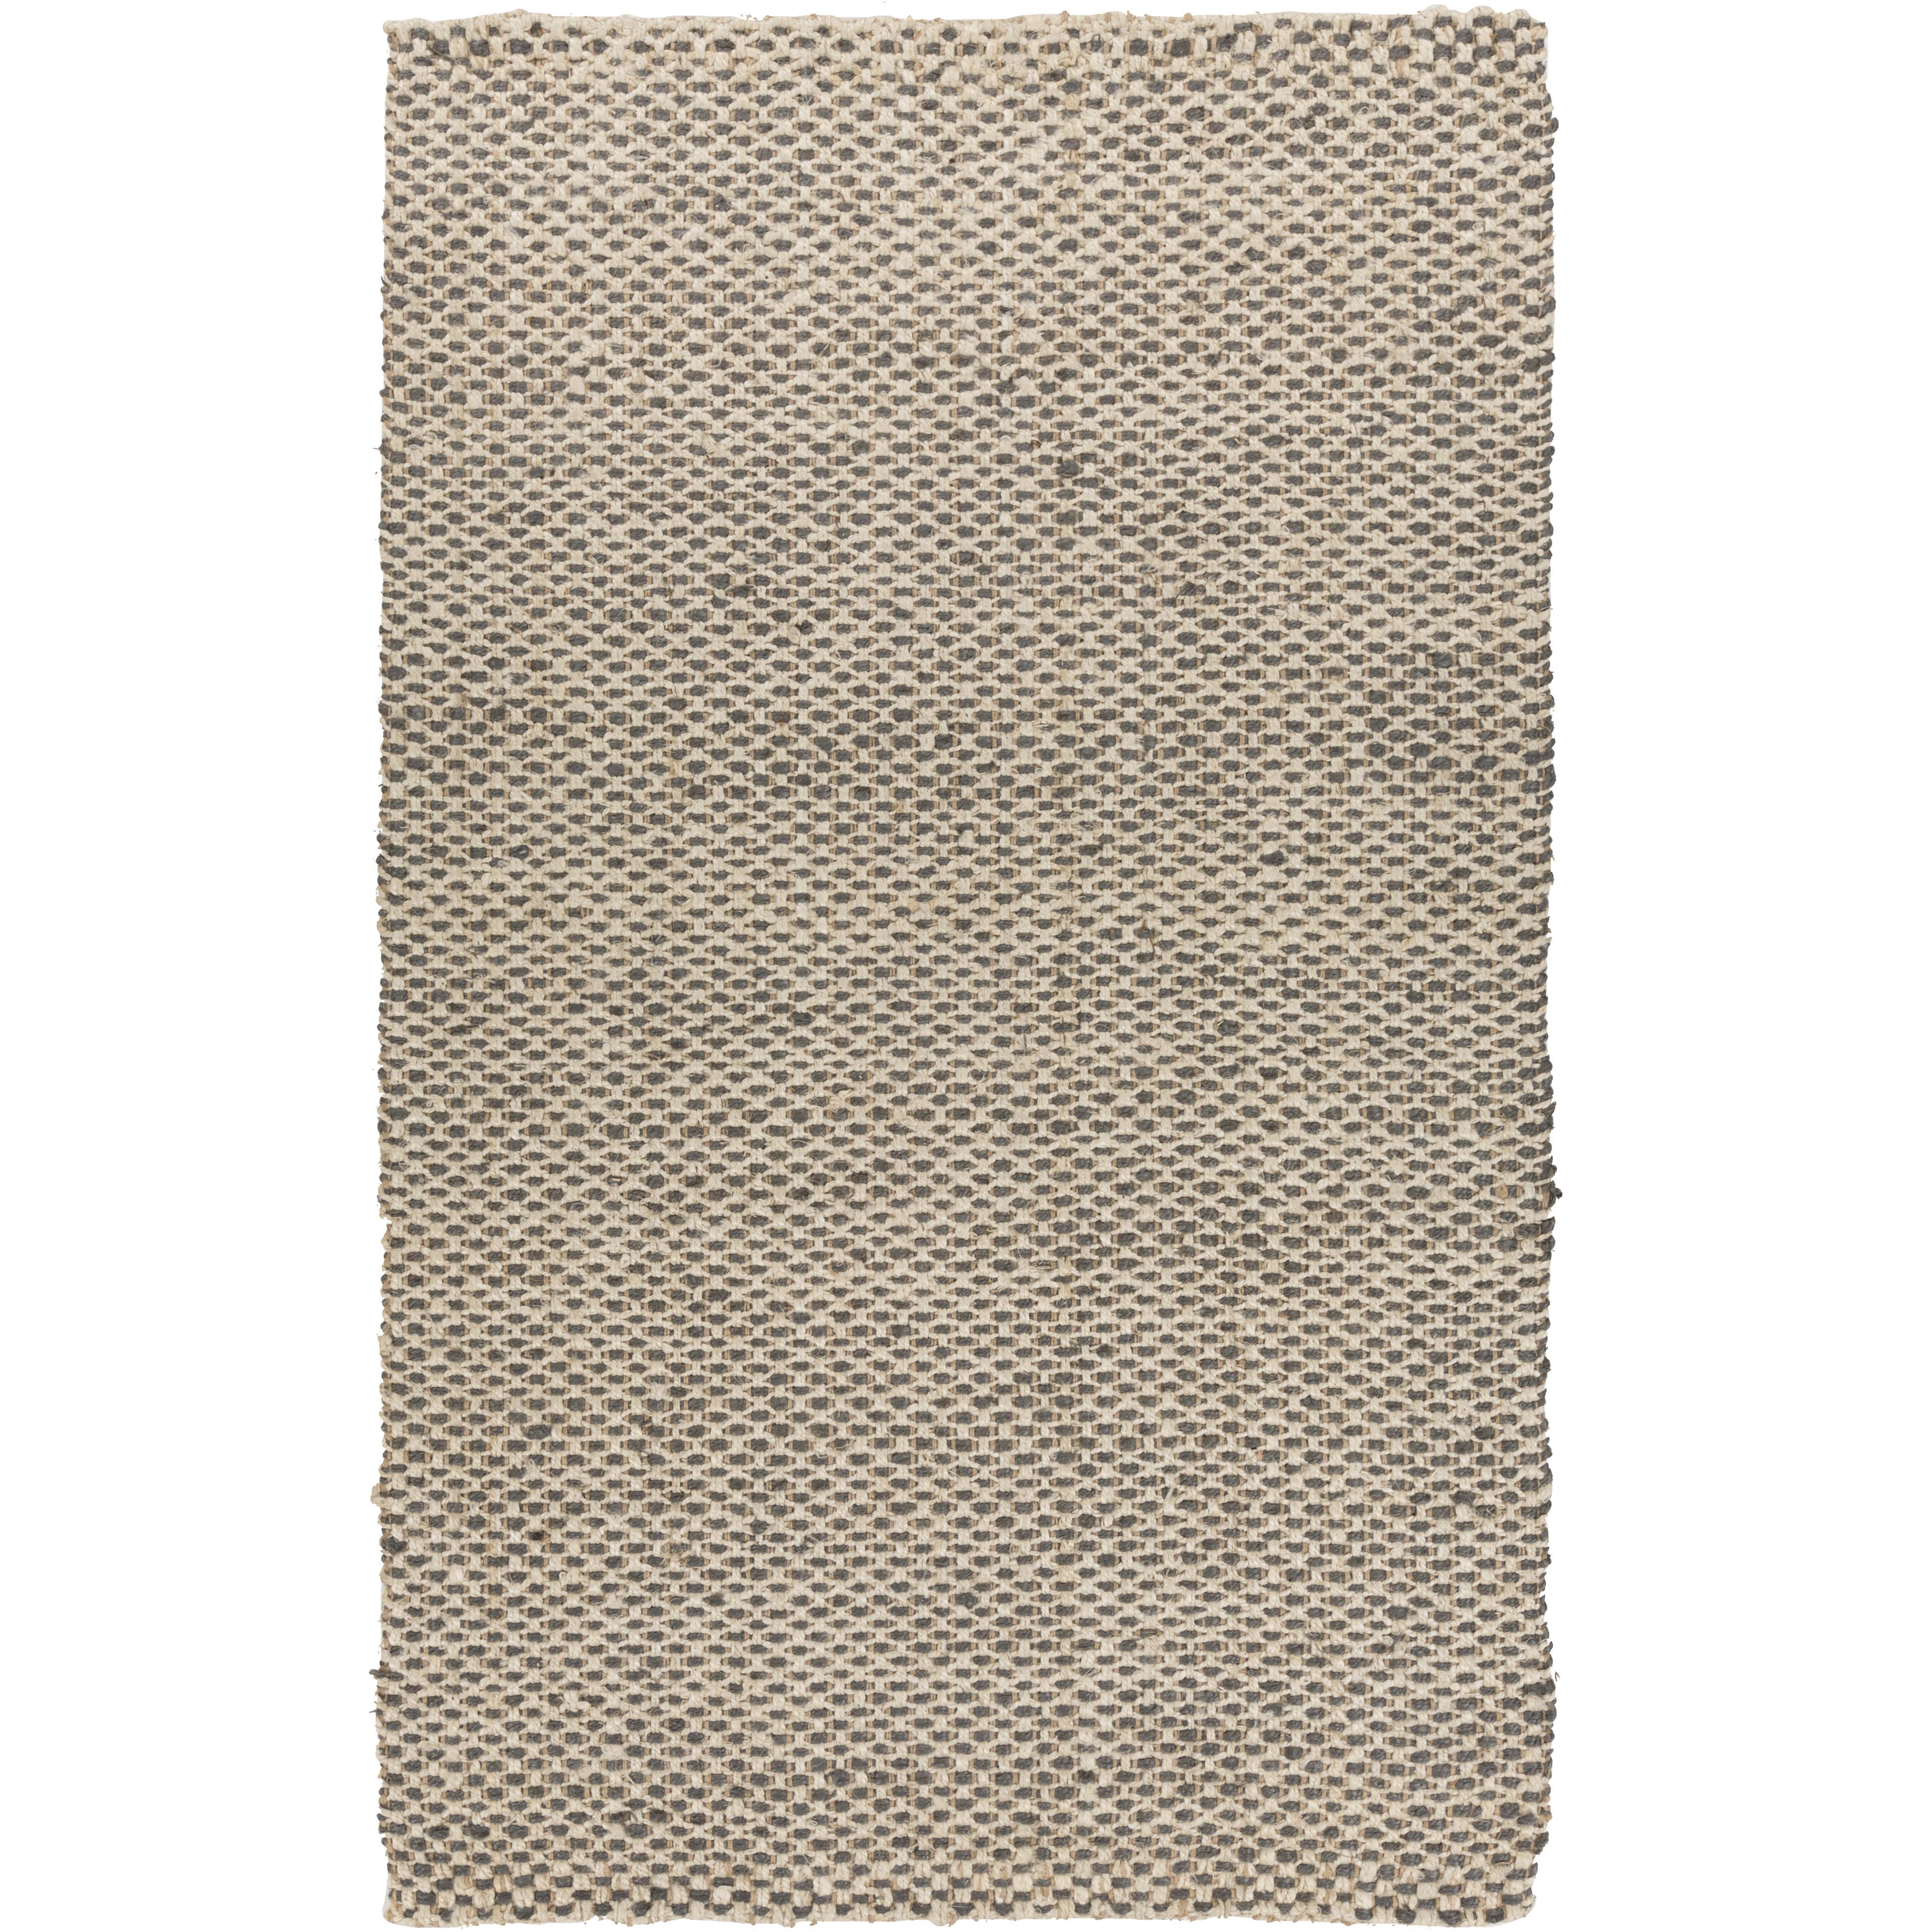 Surya Reeds 10' x 14' - Item Number: REED826-1014